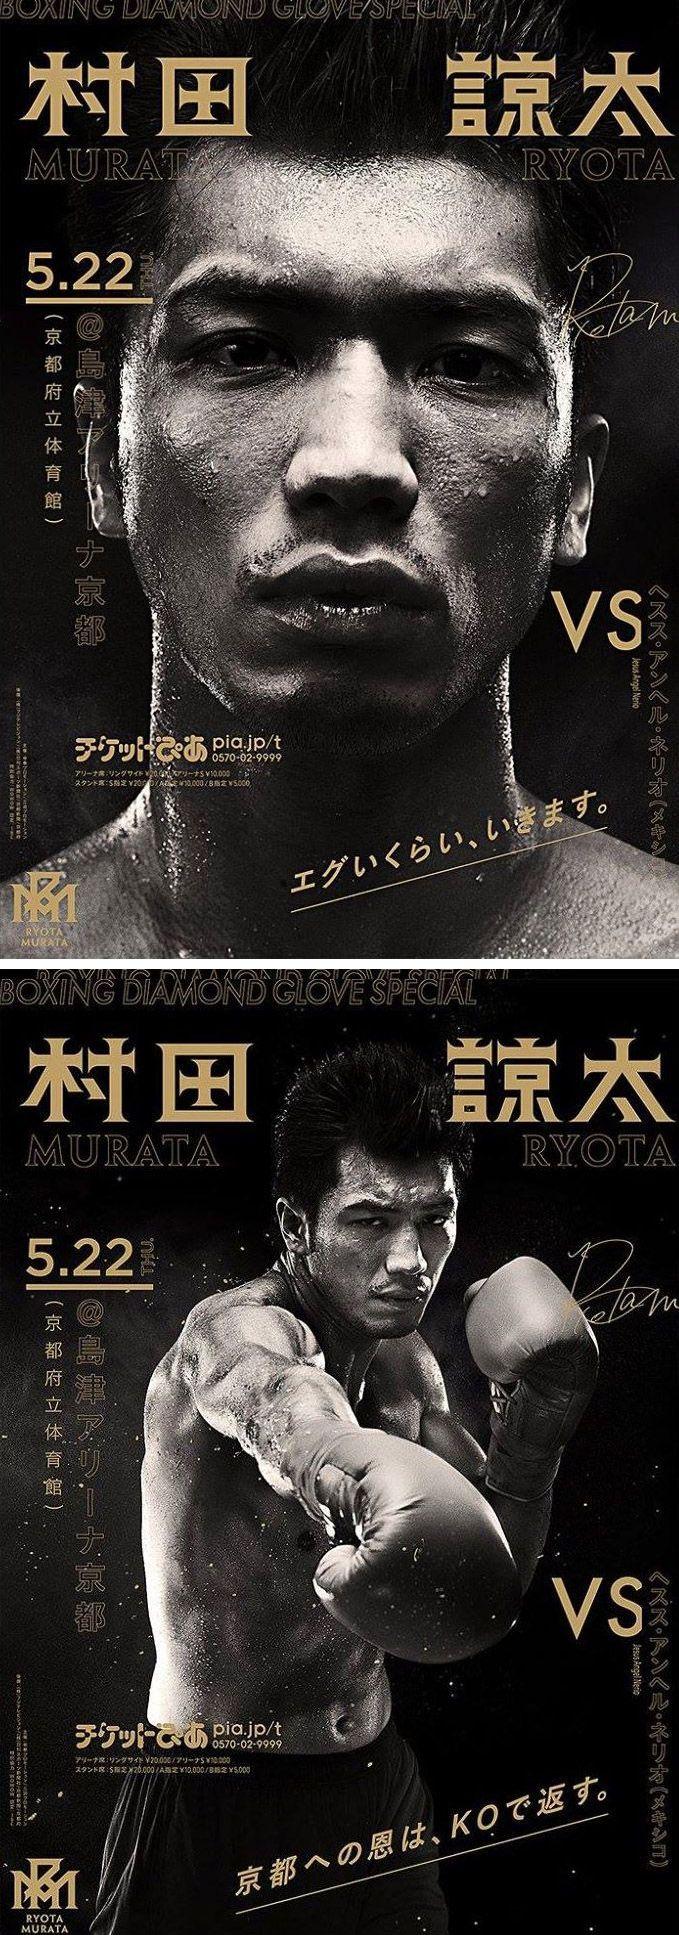 poster set | Boxing Diamond Glove Special — Ryōta Murata 村田諒太 #japan #japanese